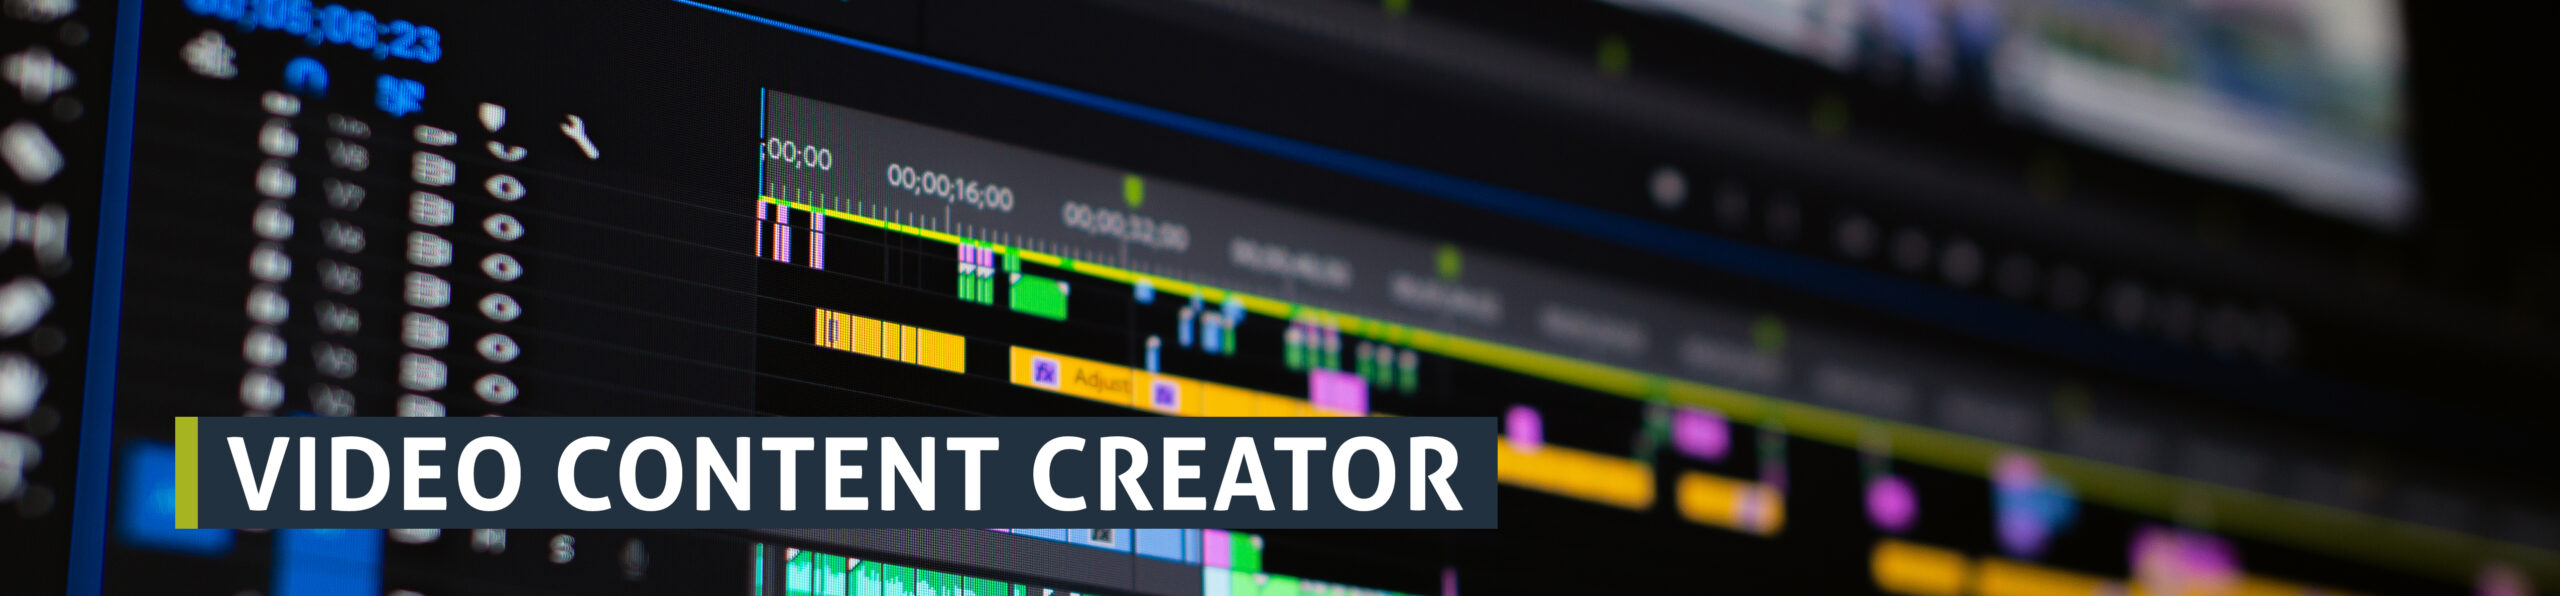 vacature video content creator